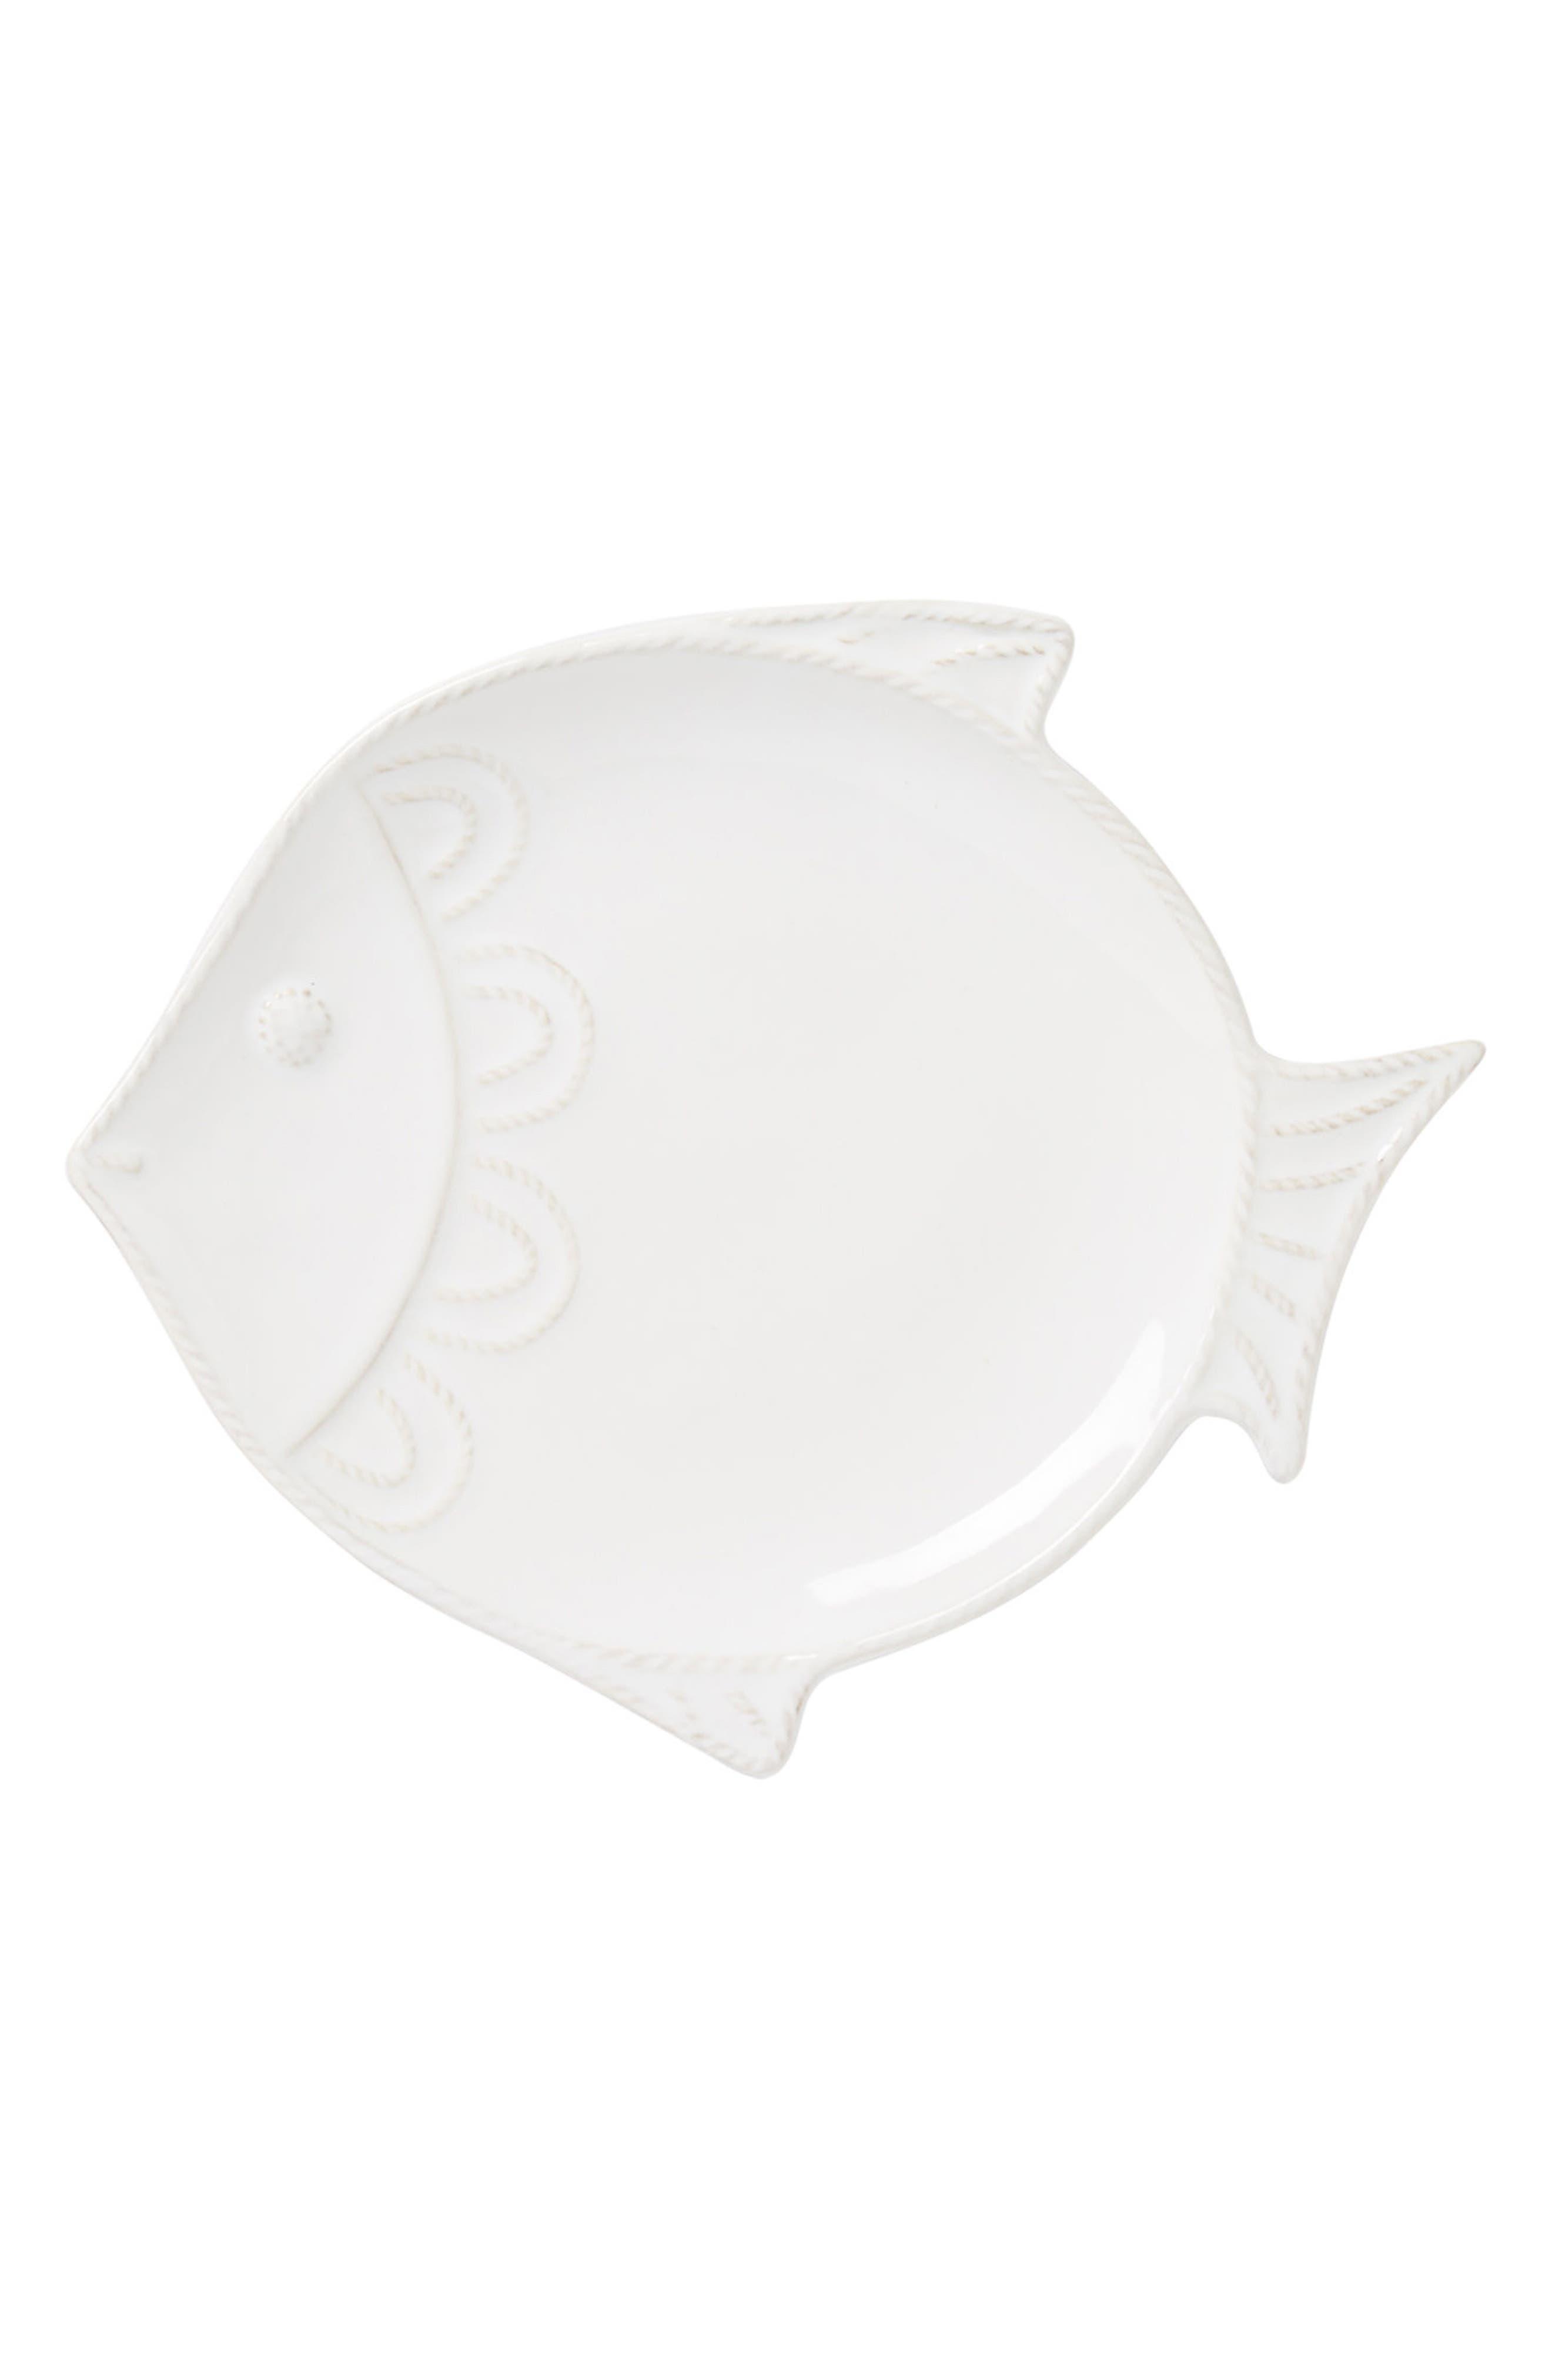 Main Image - Juliska Berry & Thread Fish Salad Plate